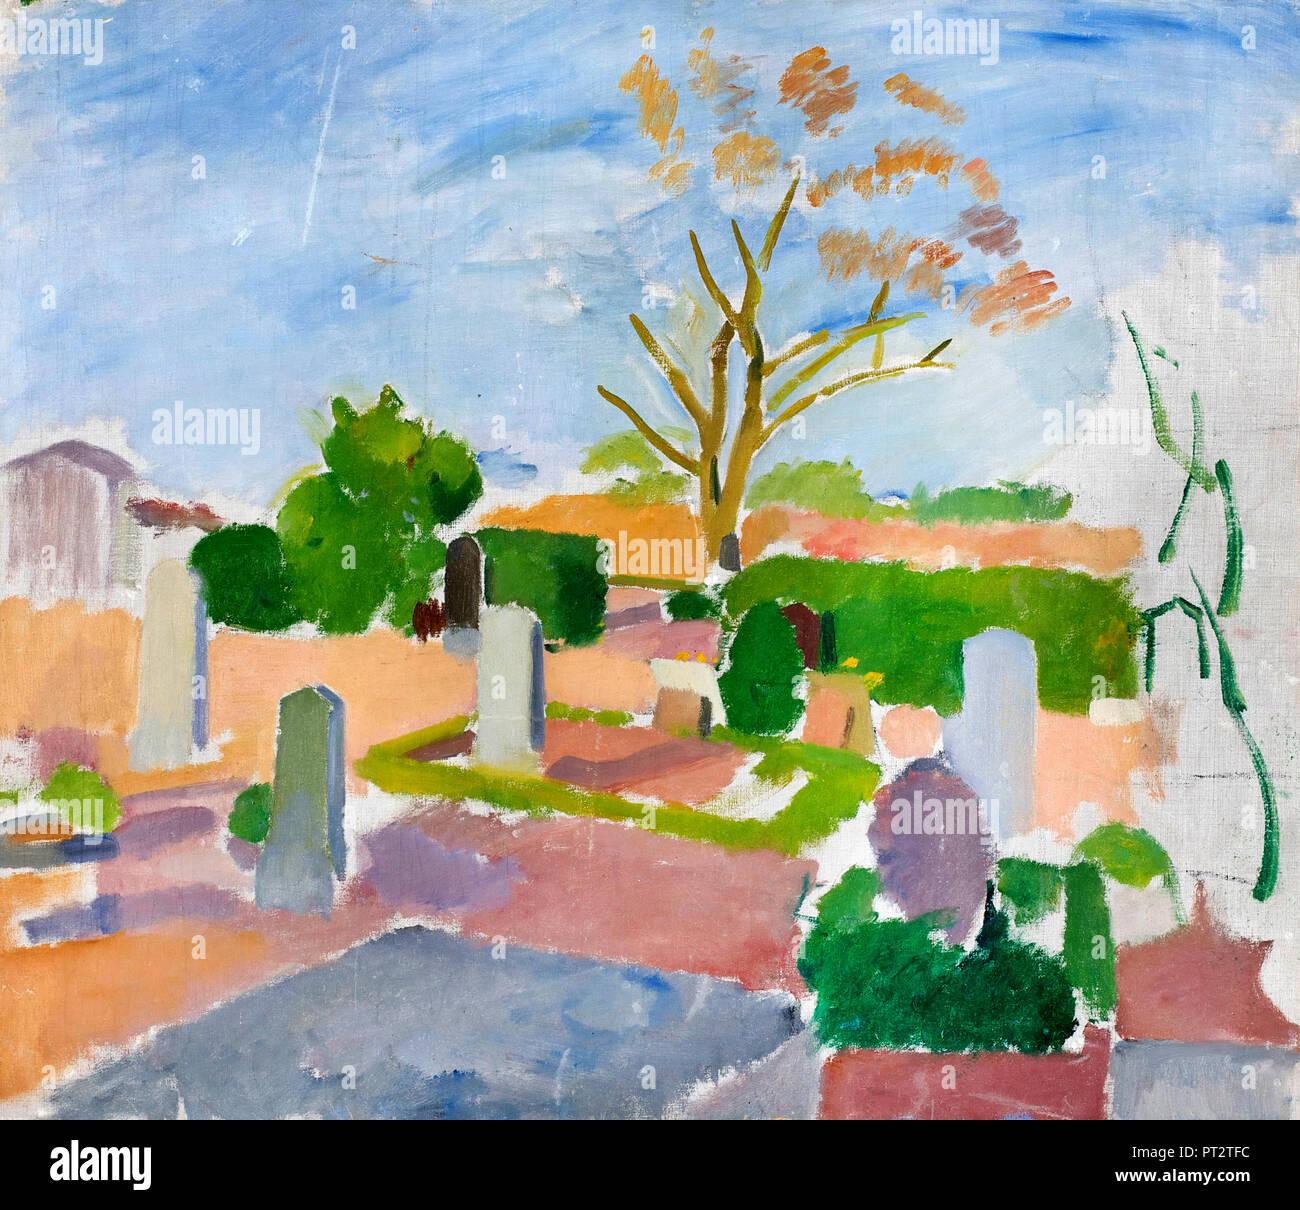 Karl Isakson, Graveyard, Christianso, Circa 1911-1913 Oil on canvas. - Stock Image